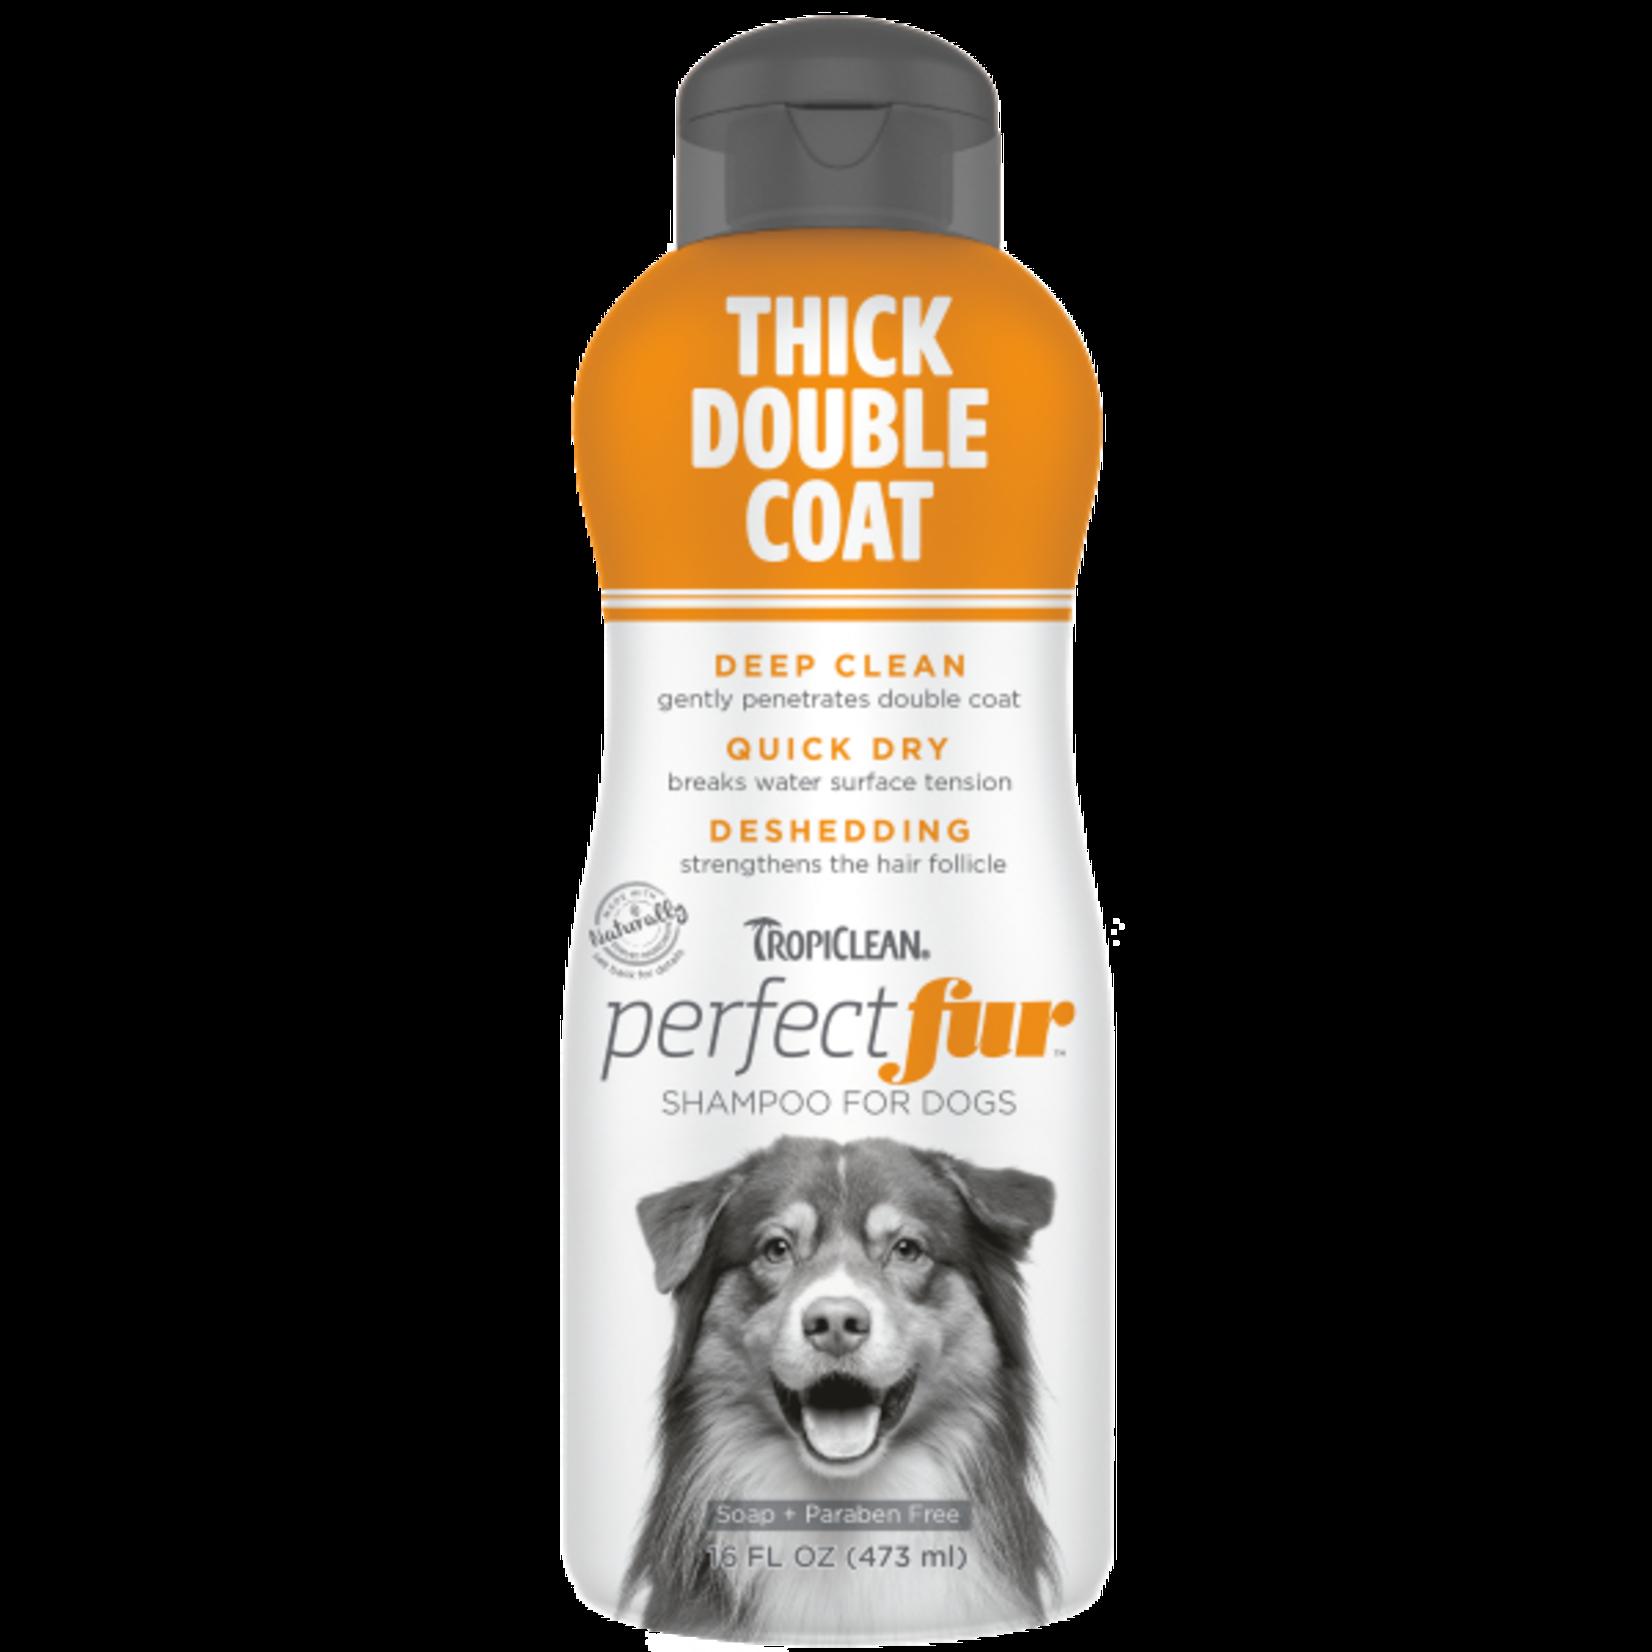 Perfect Fur Thick Double Coat Shampoo 16 oz